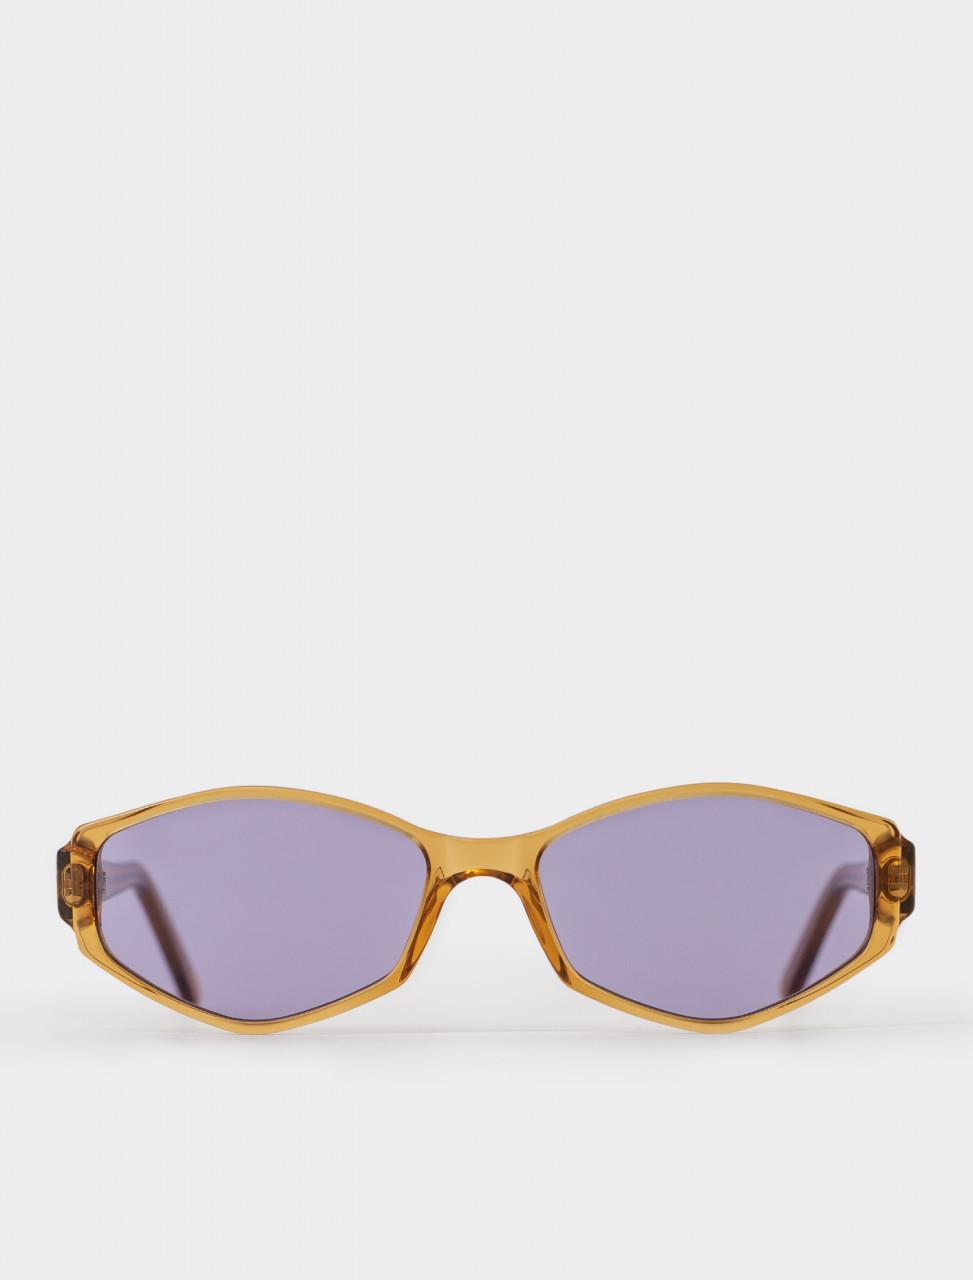 Moira Sunglasses in Brown